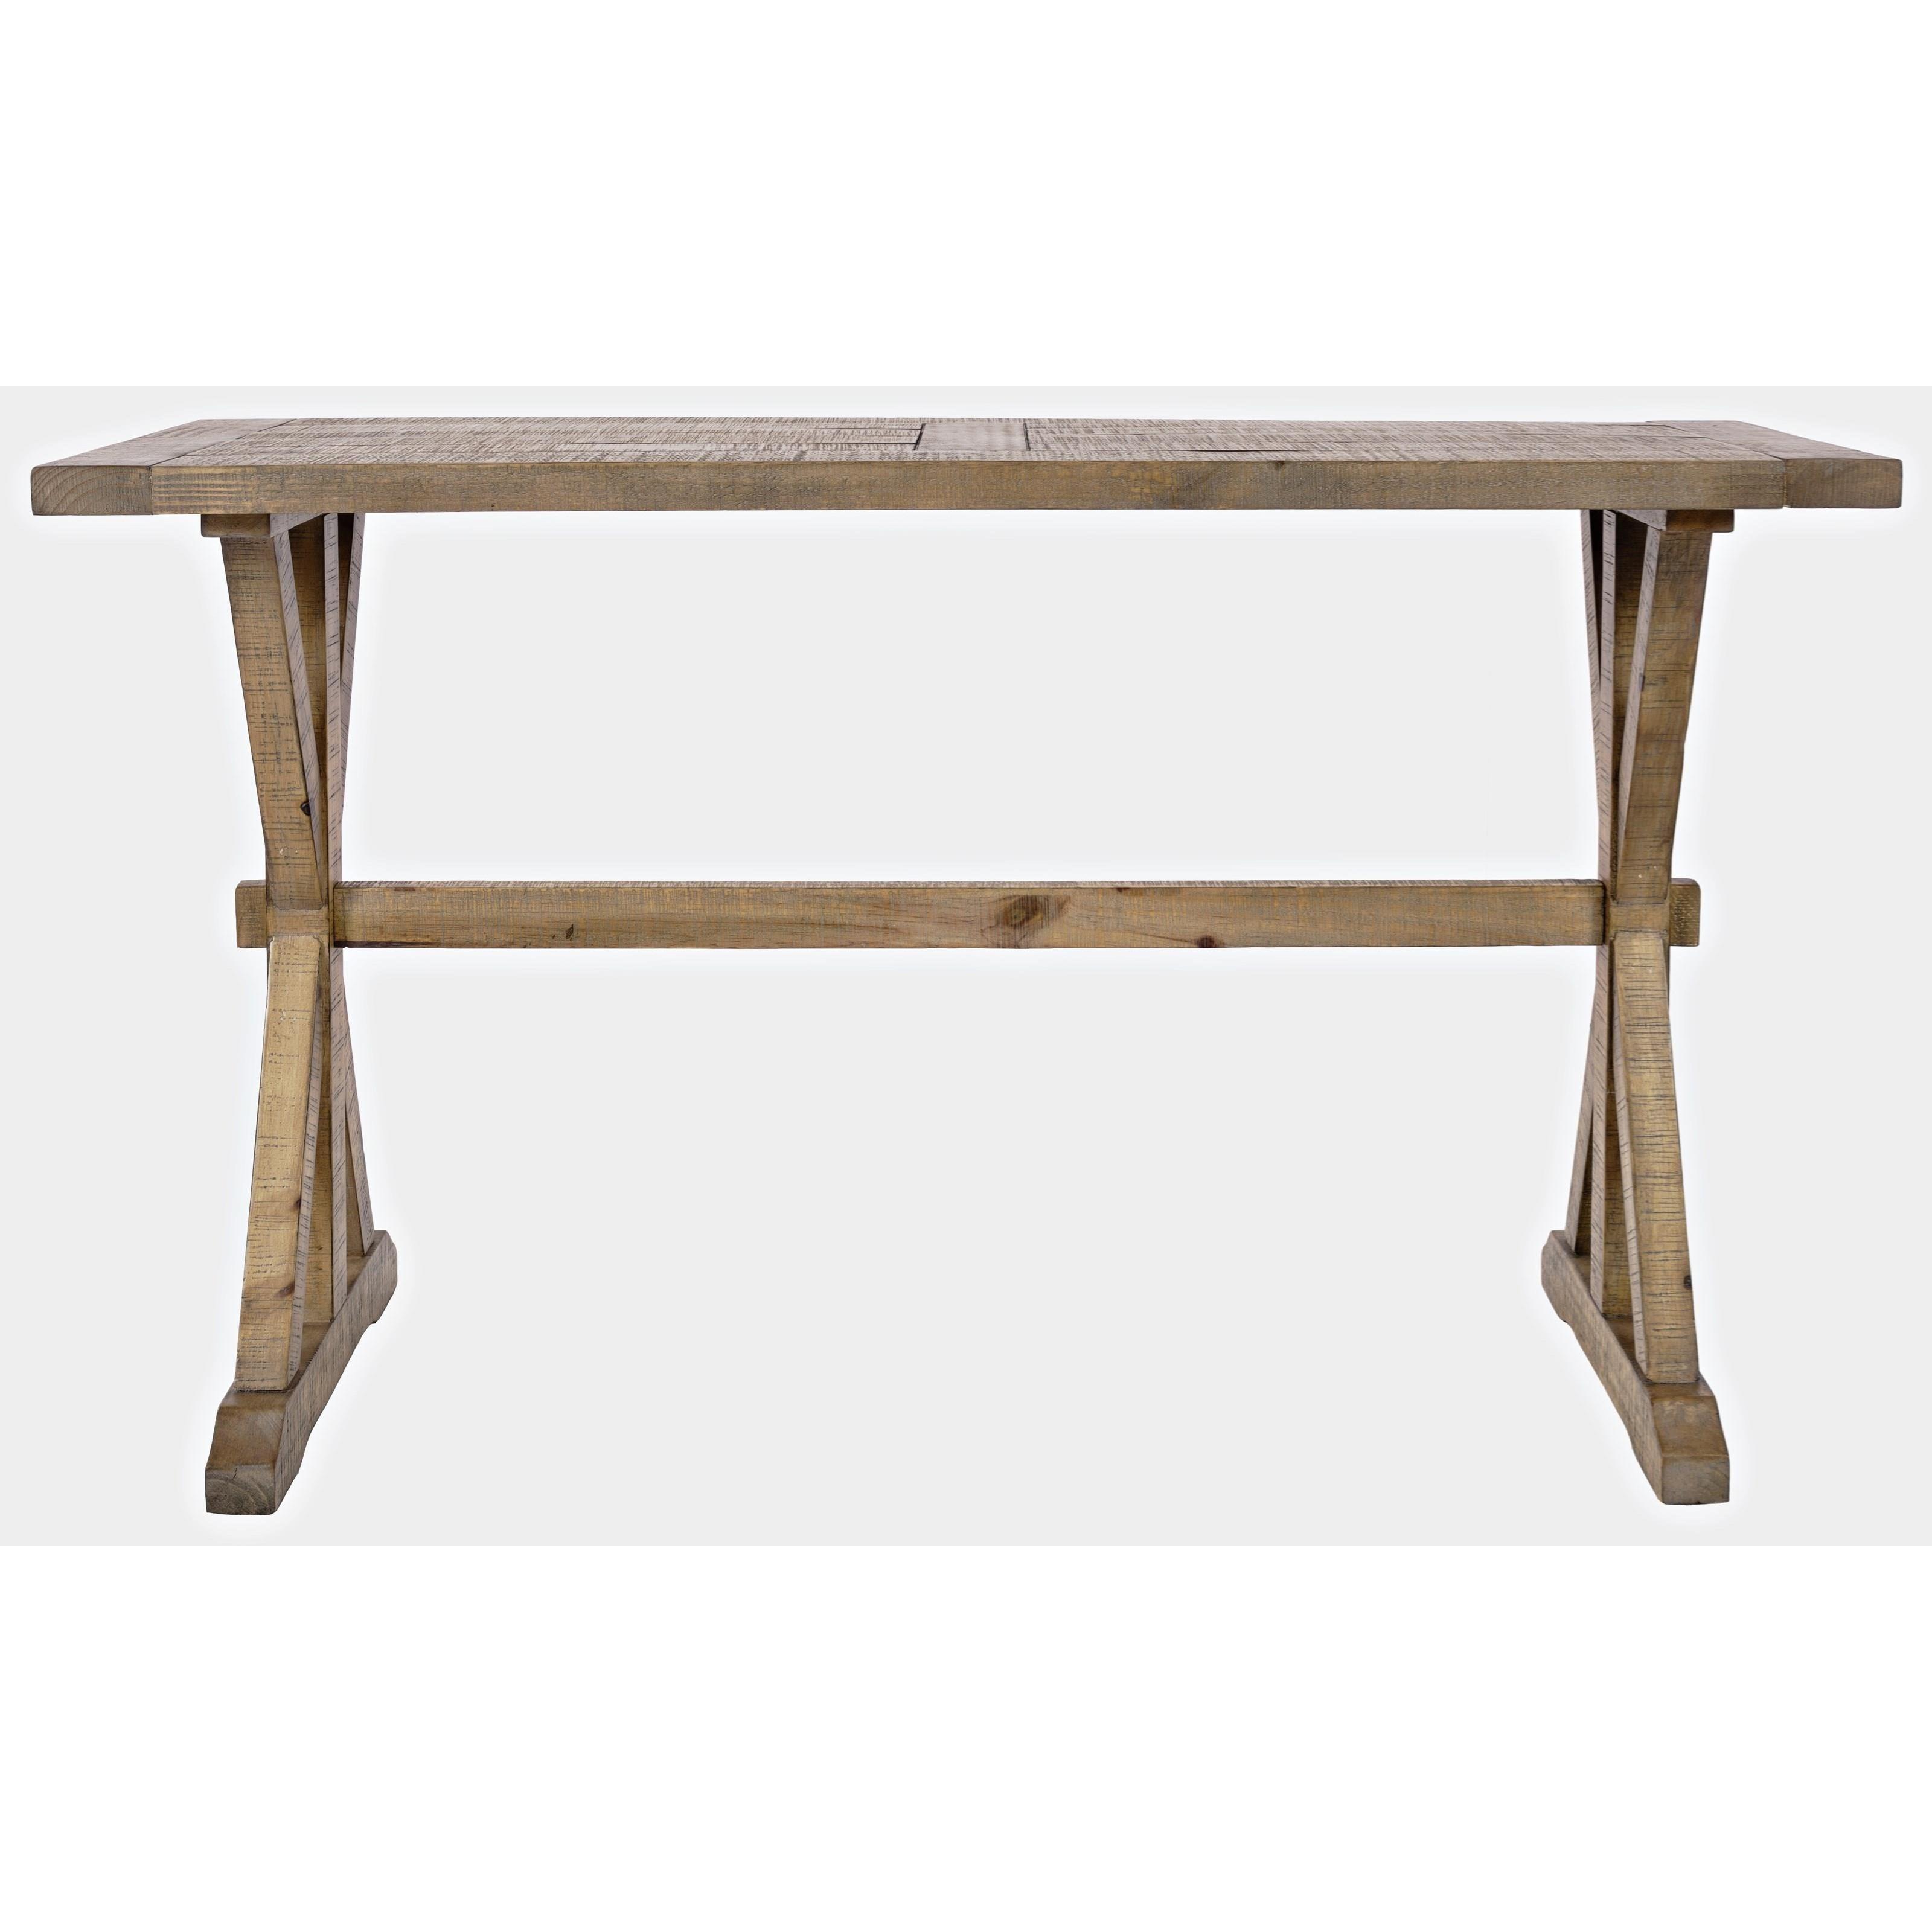 Carlyle Crossing Sofa Table by Jofran at Jofran